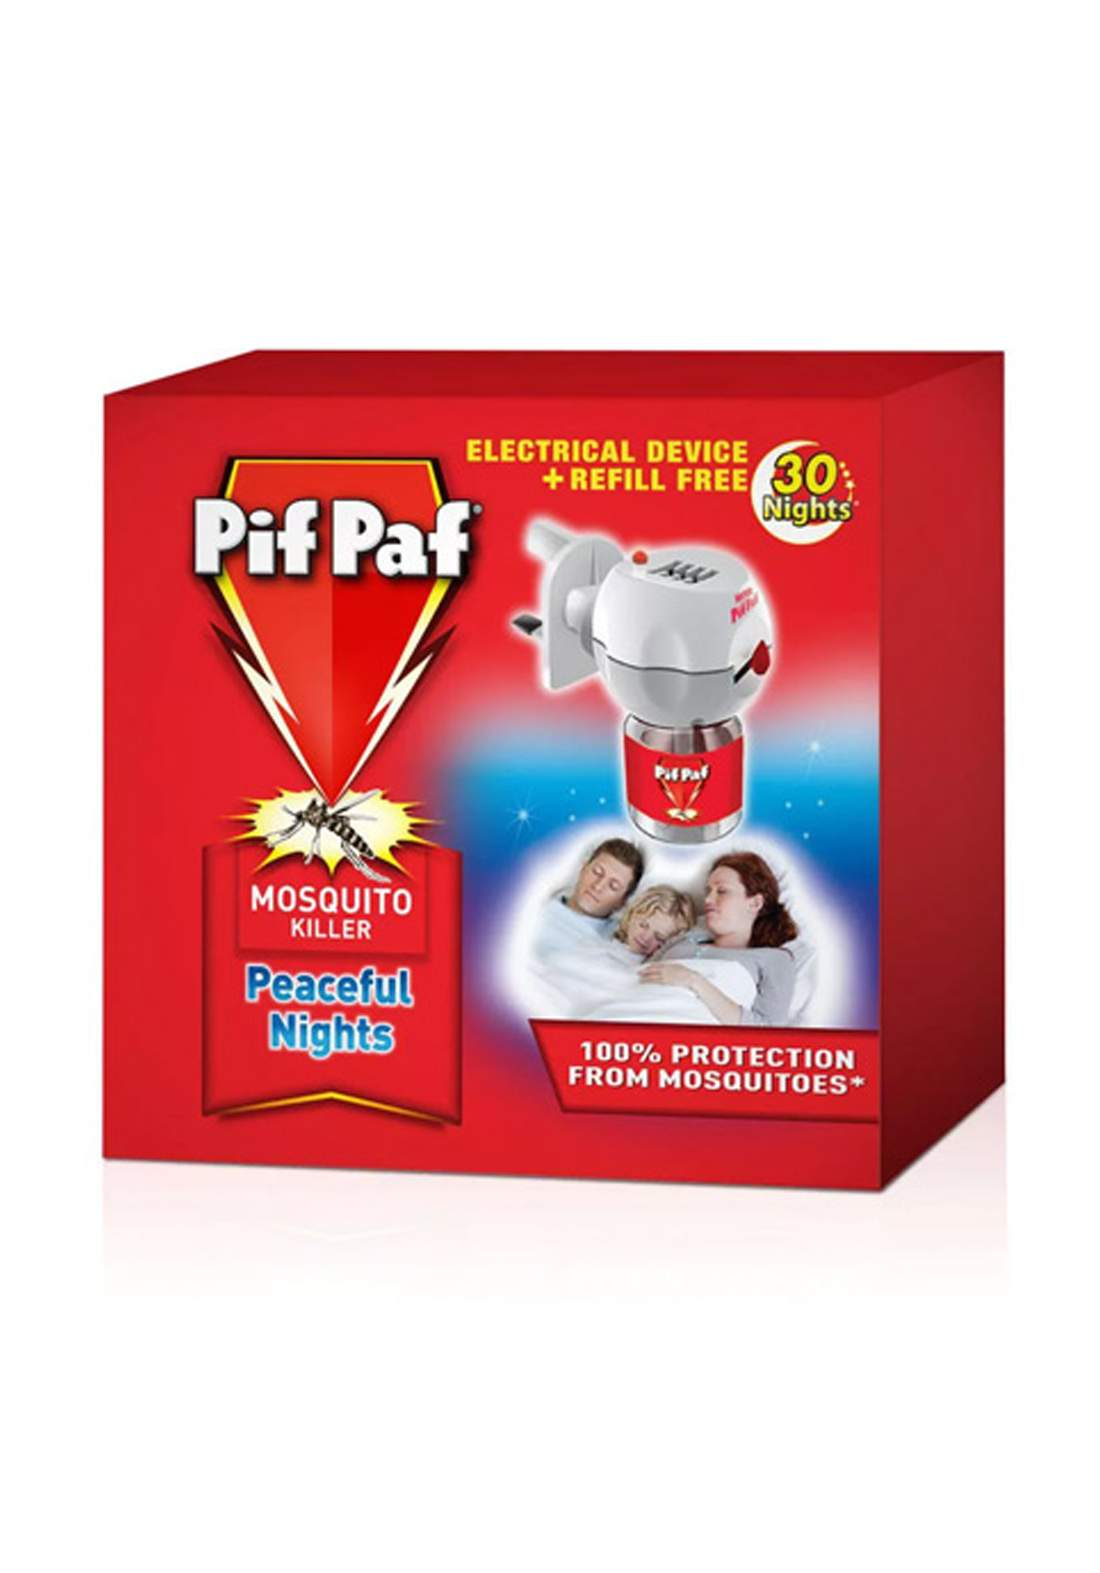 Pif Paf Liquid Mosquito Killer Device جهاز كهربائي لقتل البعوض